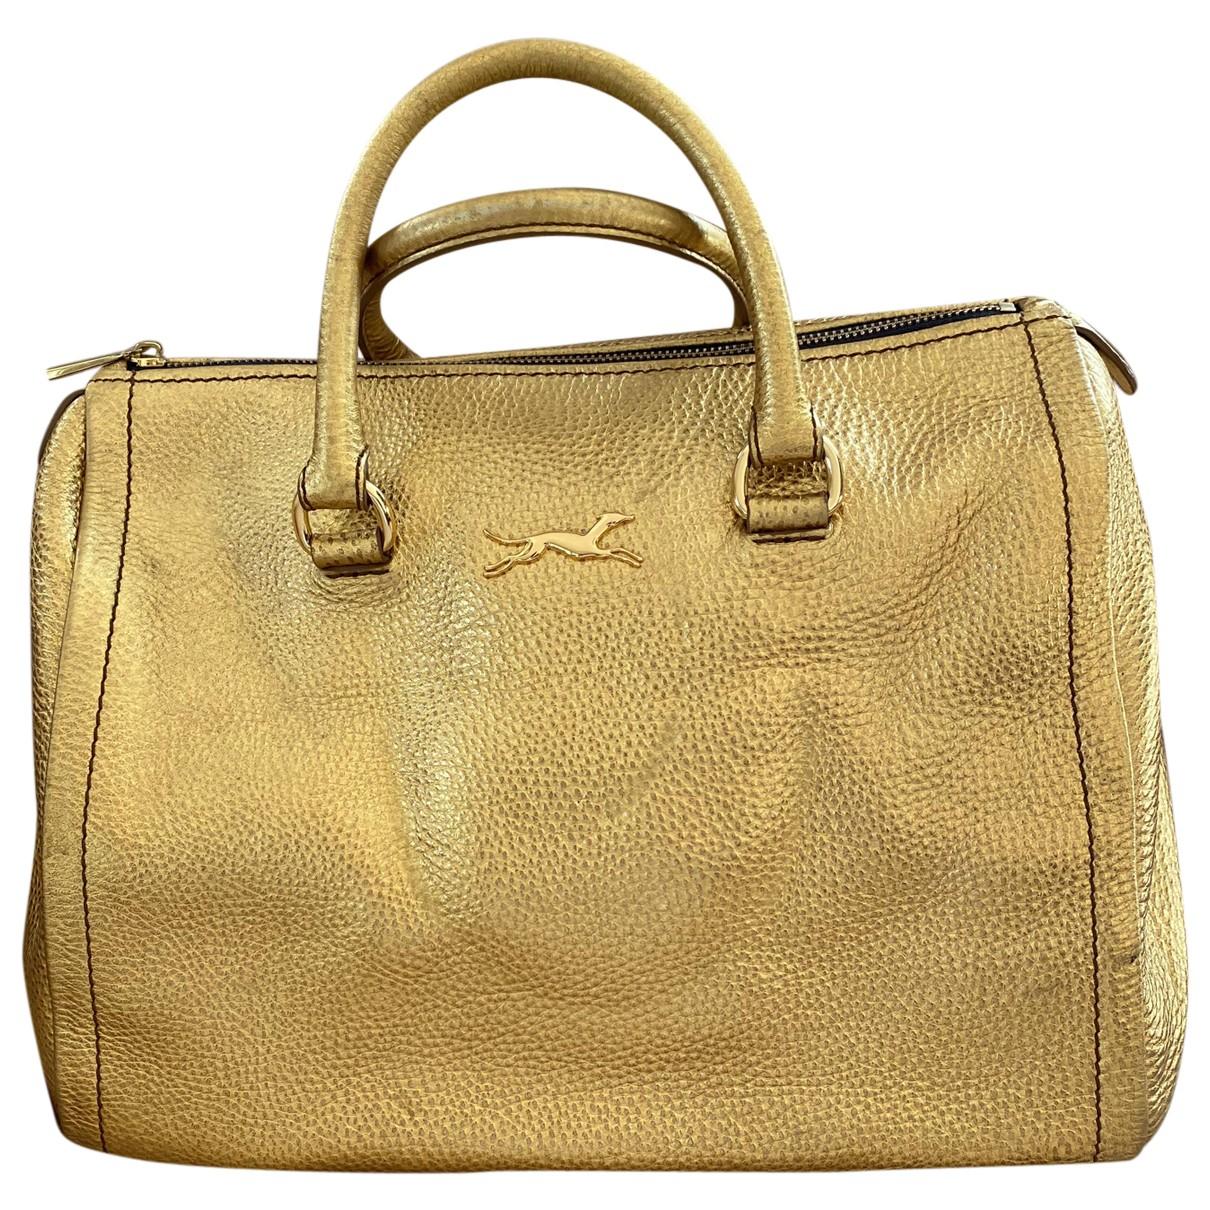 Bimba Y Lola \N Handtasche in  Gold Leder